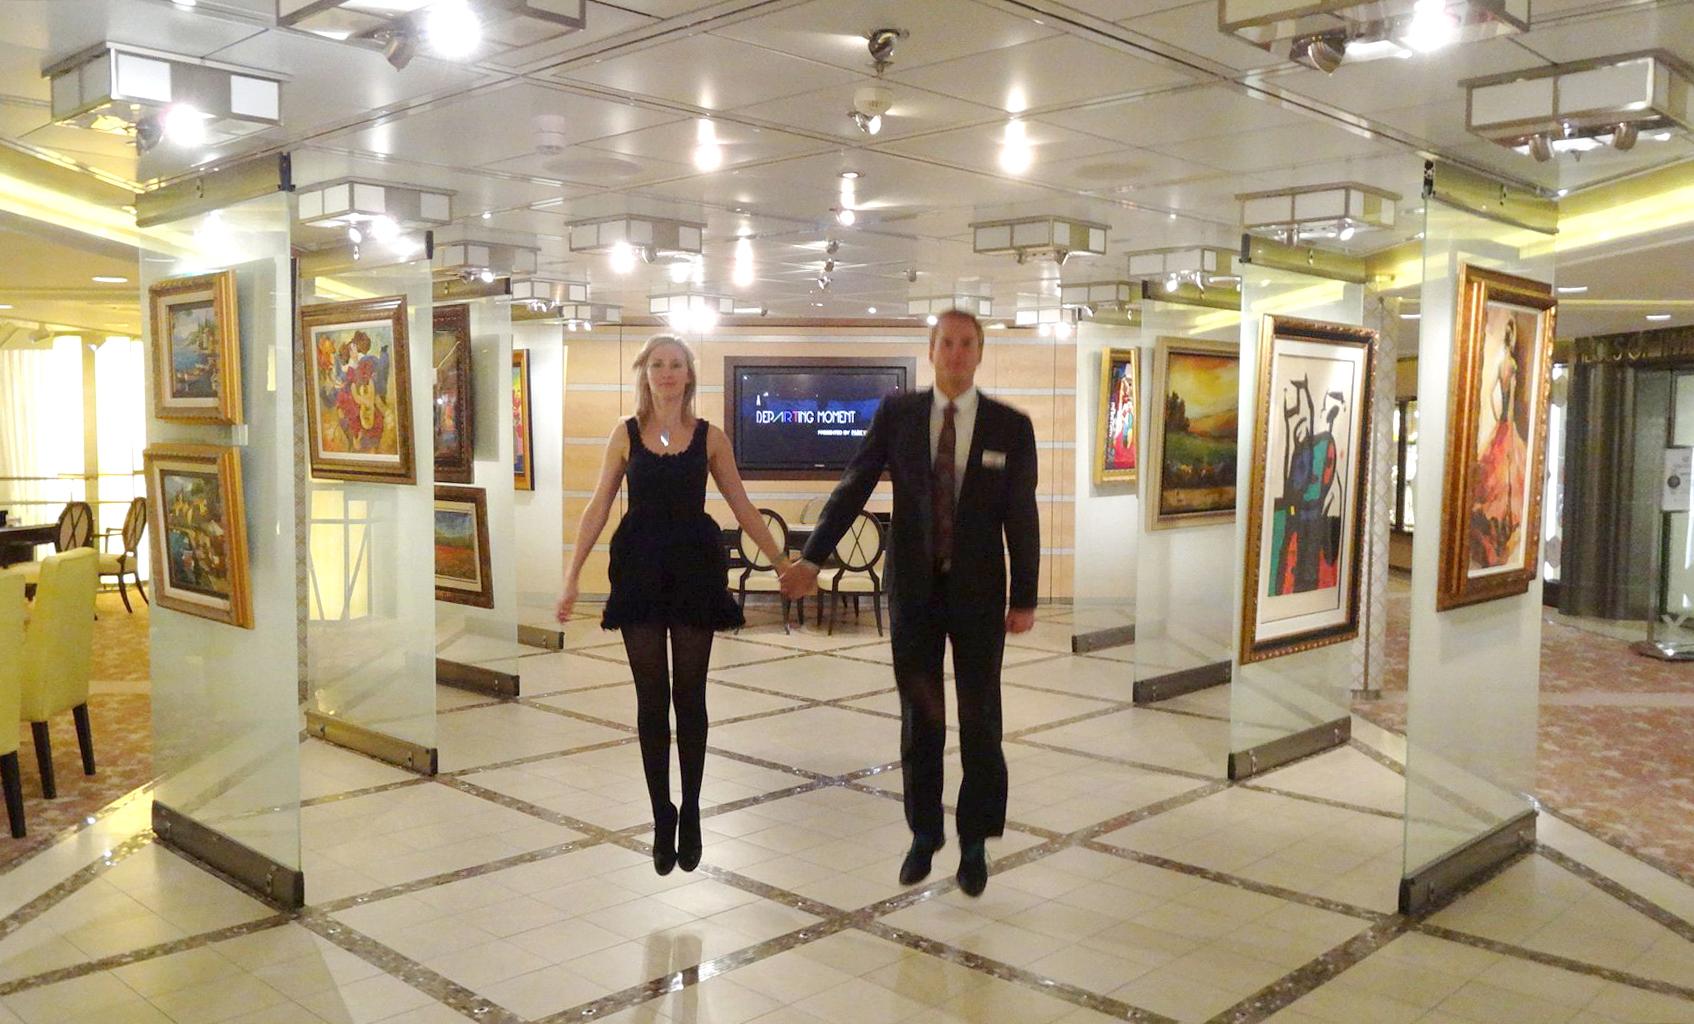 These industrious art auctioneers aren't afraid to show off their fun-loving side. Photo credit: Jeanne van der Merwe